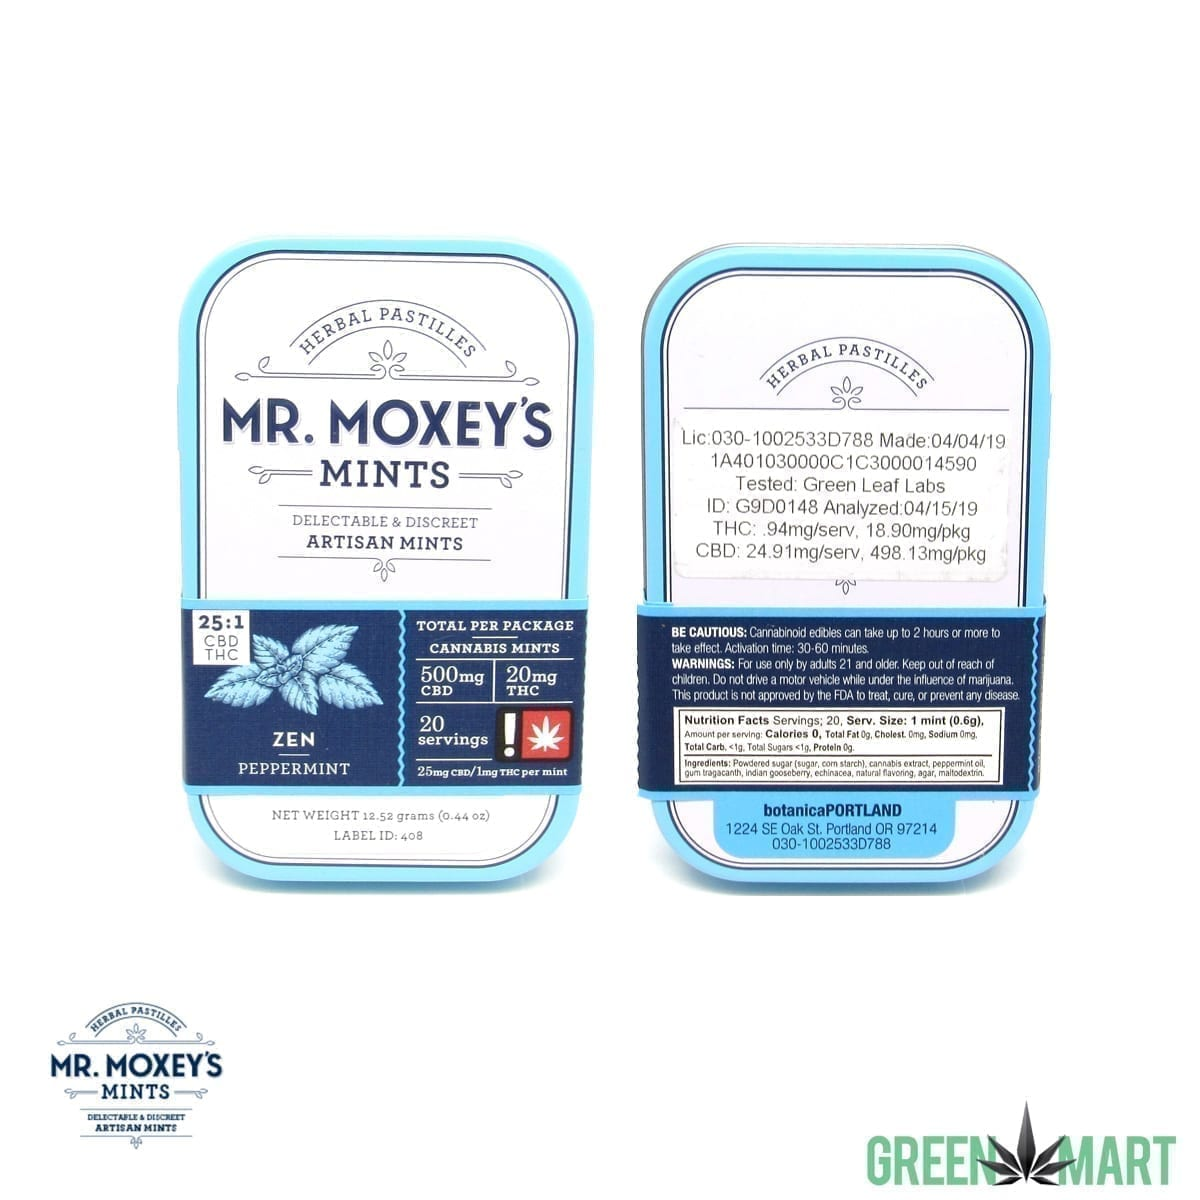 Mr. Moxey's Mints - Zen CBD 25:1 Peppermint